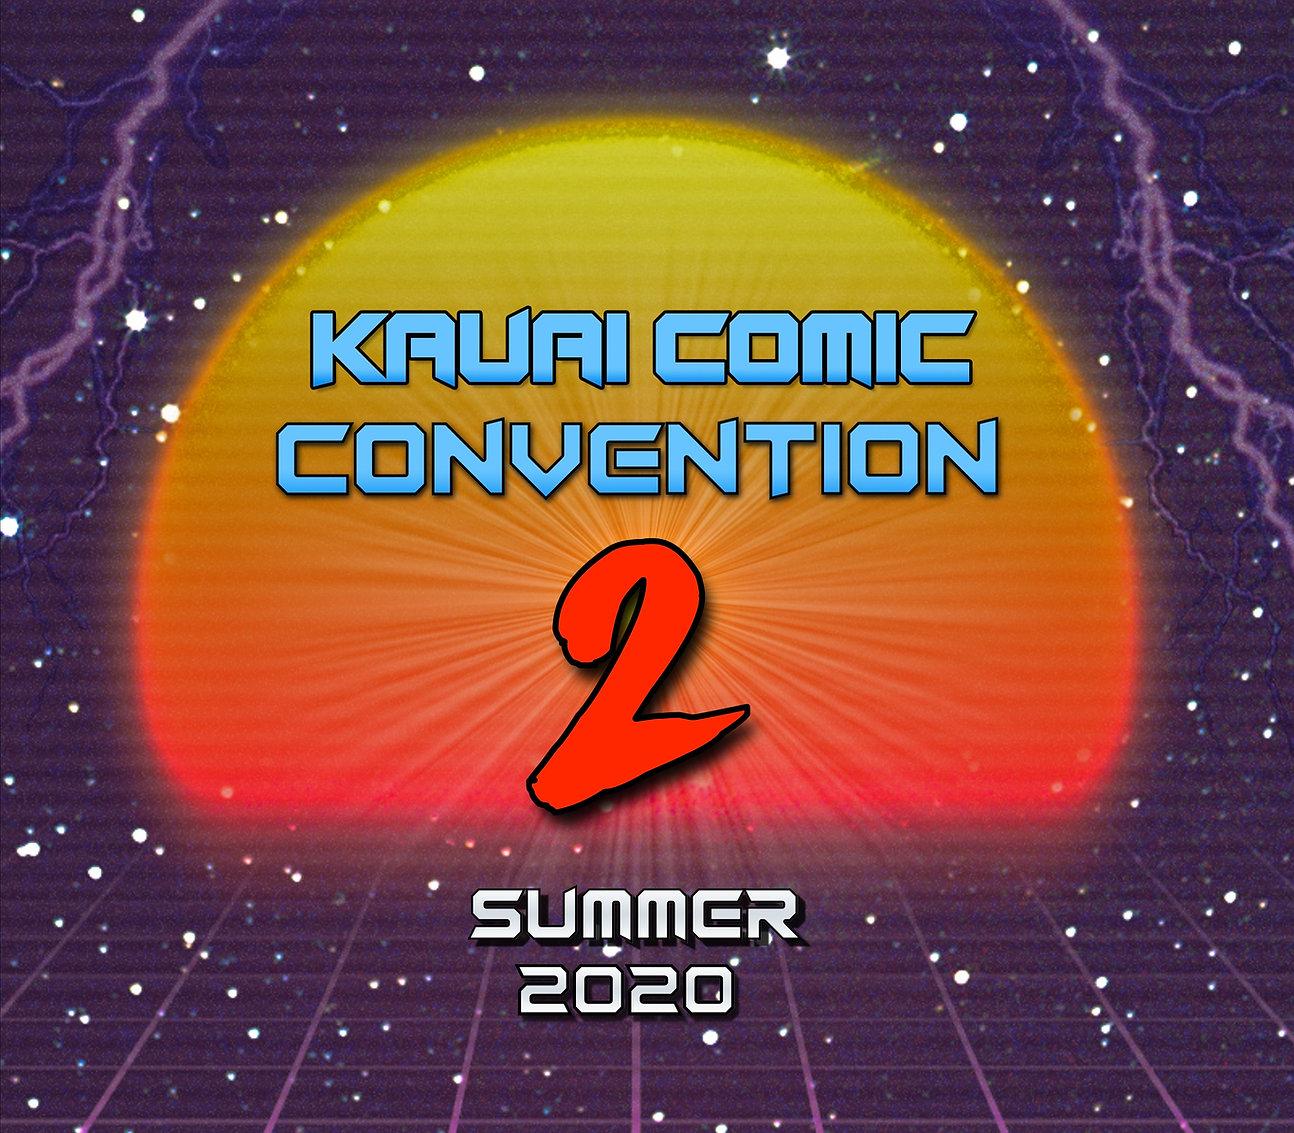 kauaicomiccon2.jpg